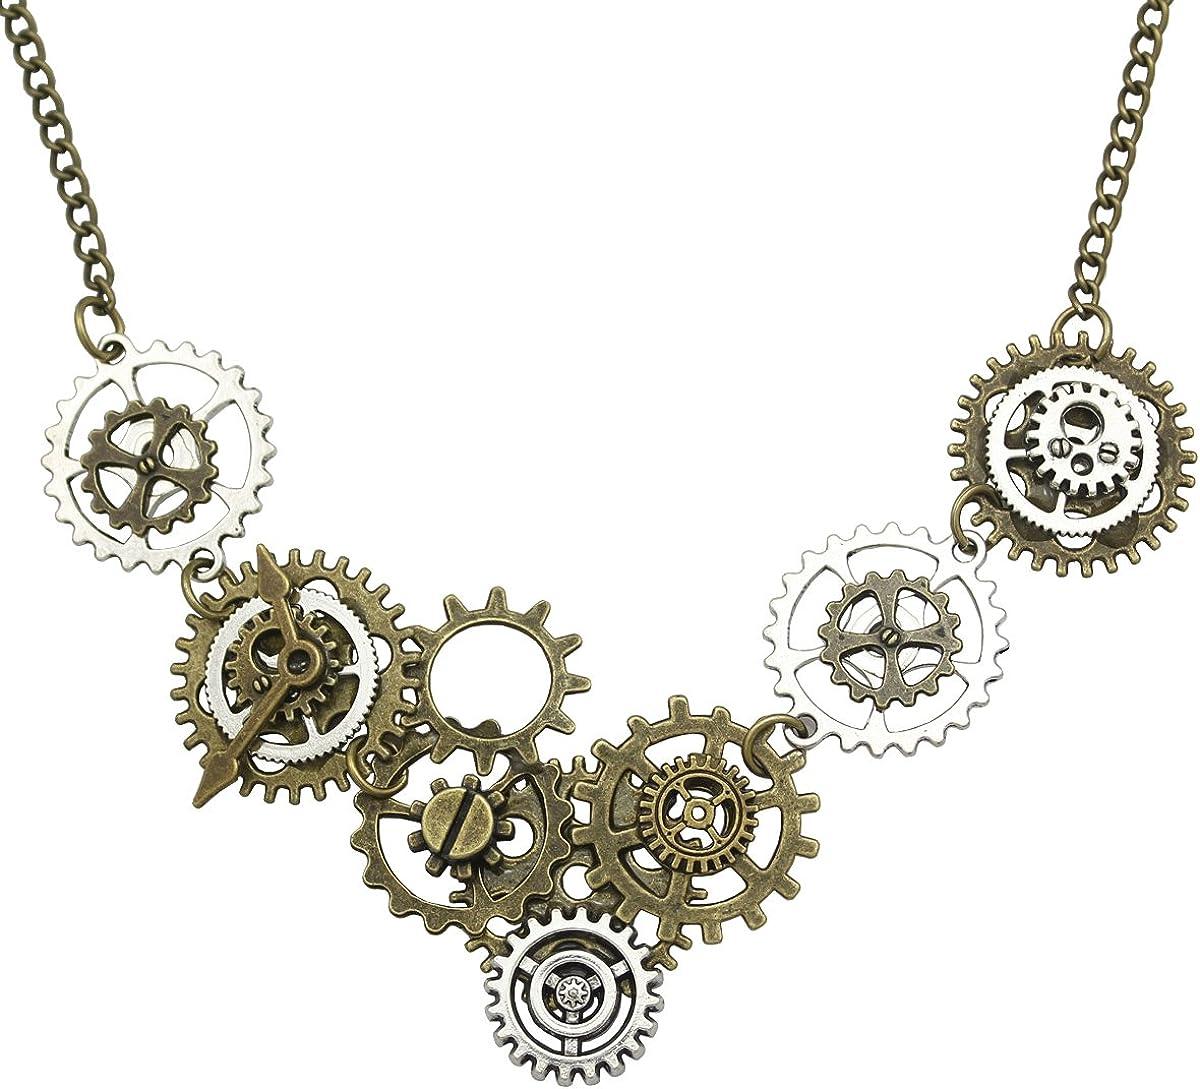 Steampunk Metal Cogs Necklace Fancy Dress Pendant Gothic Halloween Gears Chain